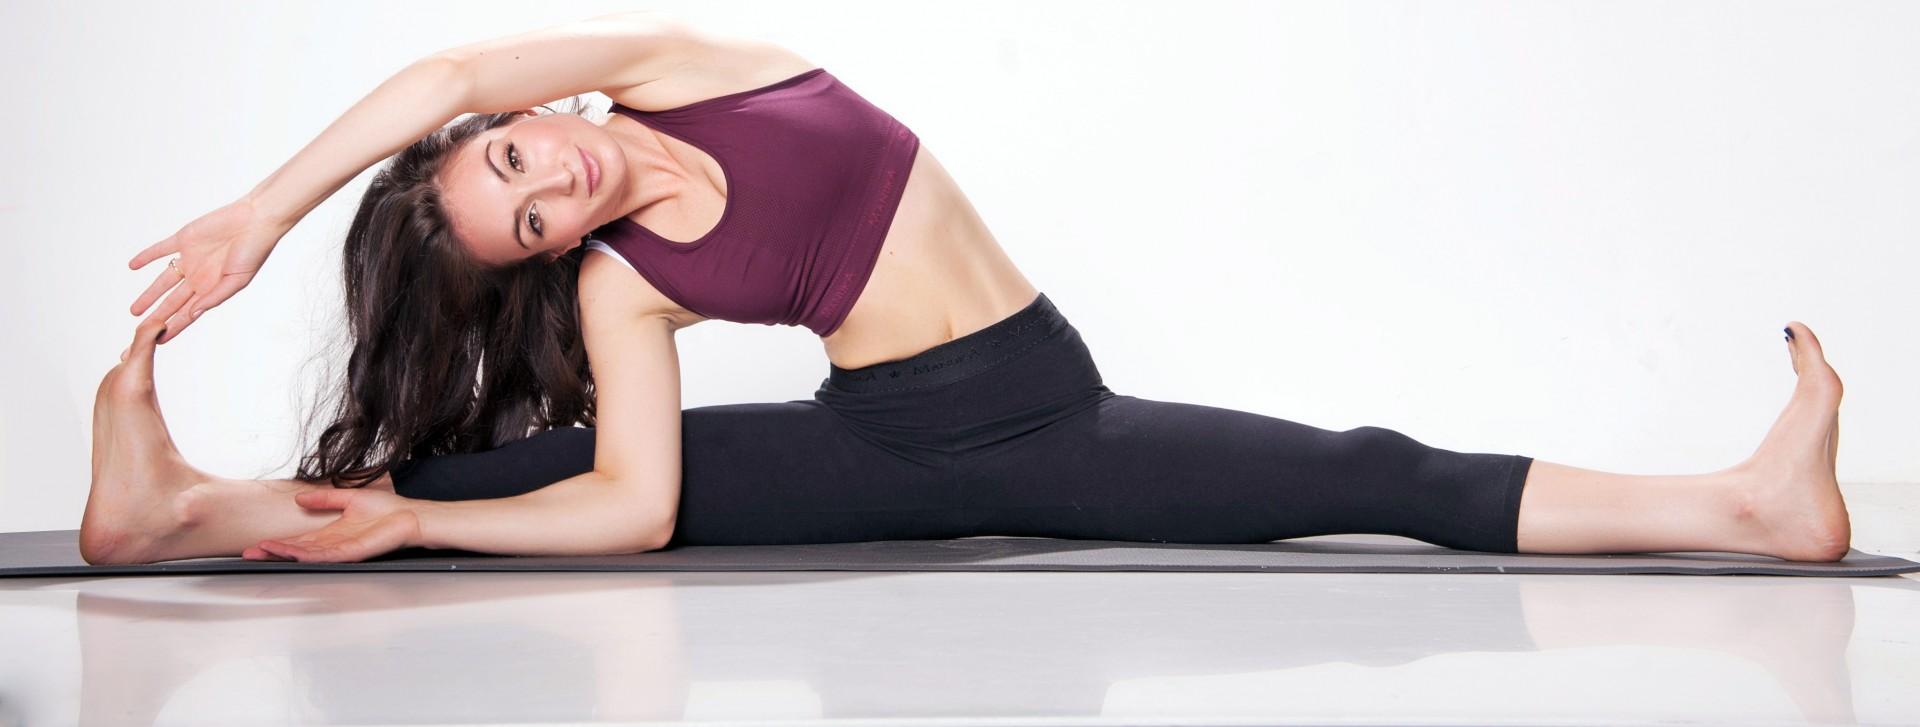 Roxy's Yoga Total Body Workout